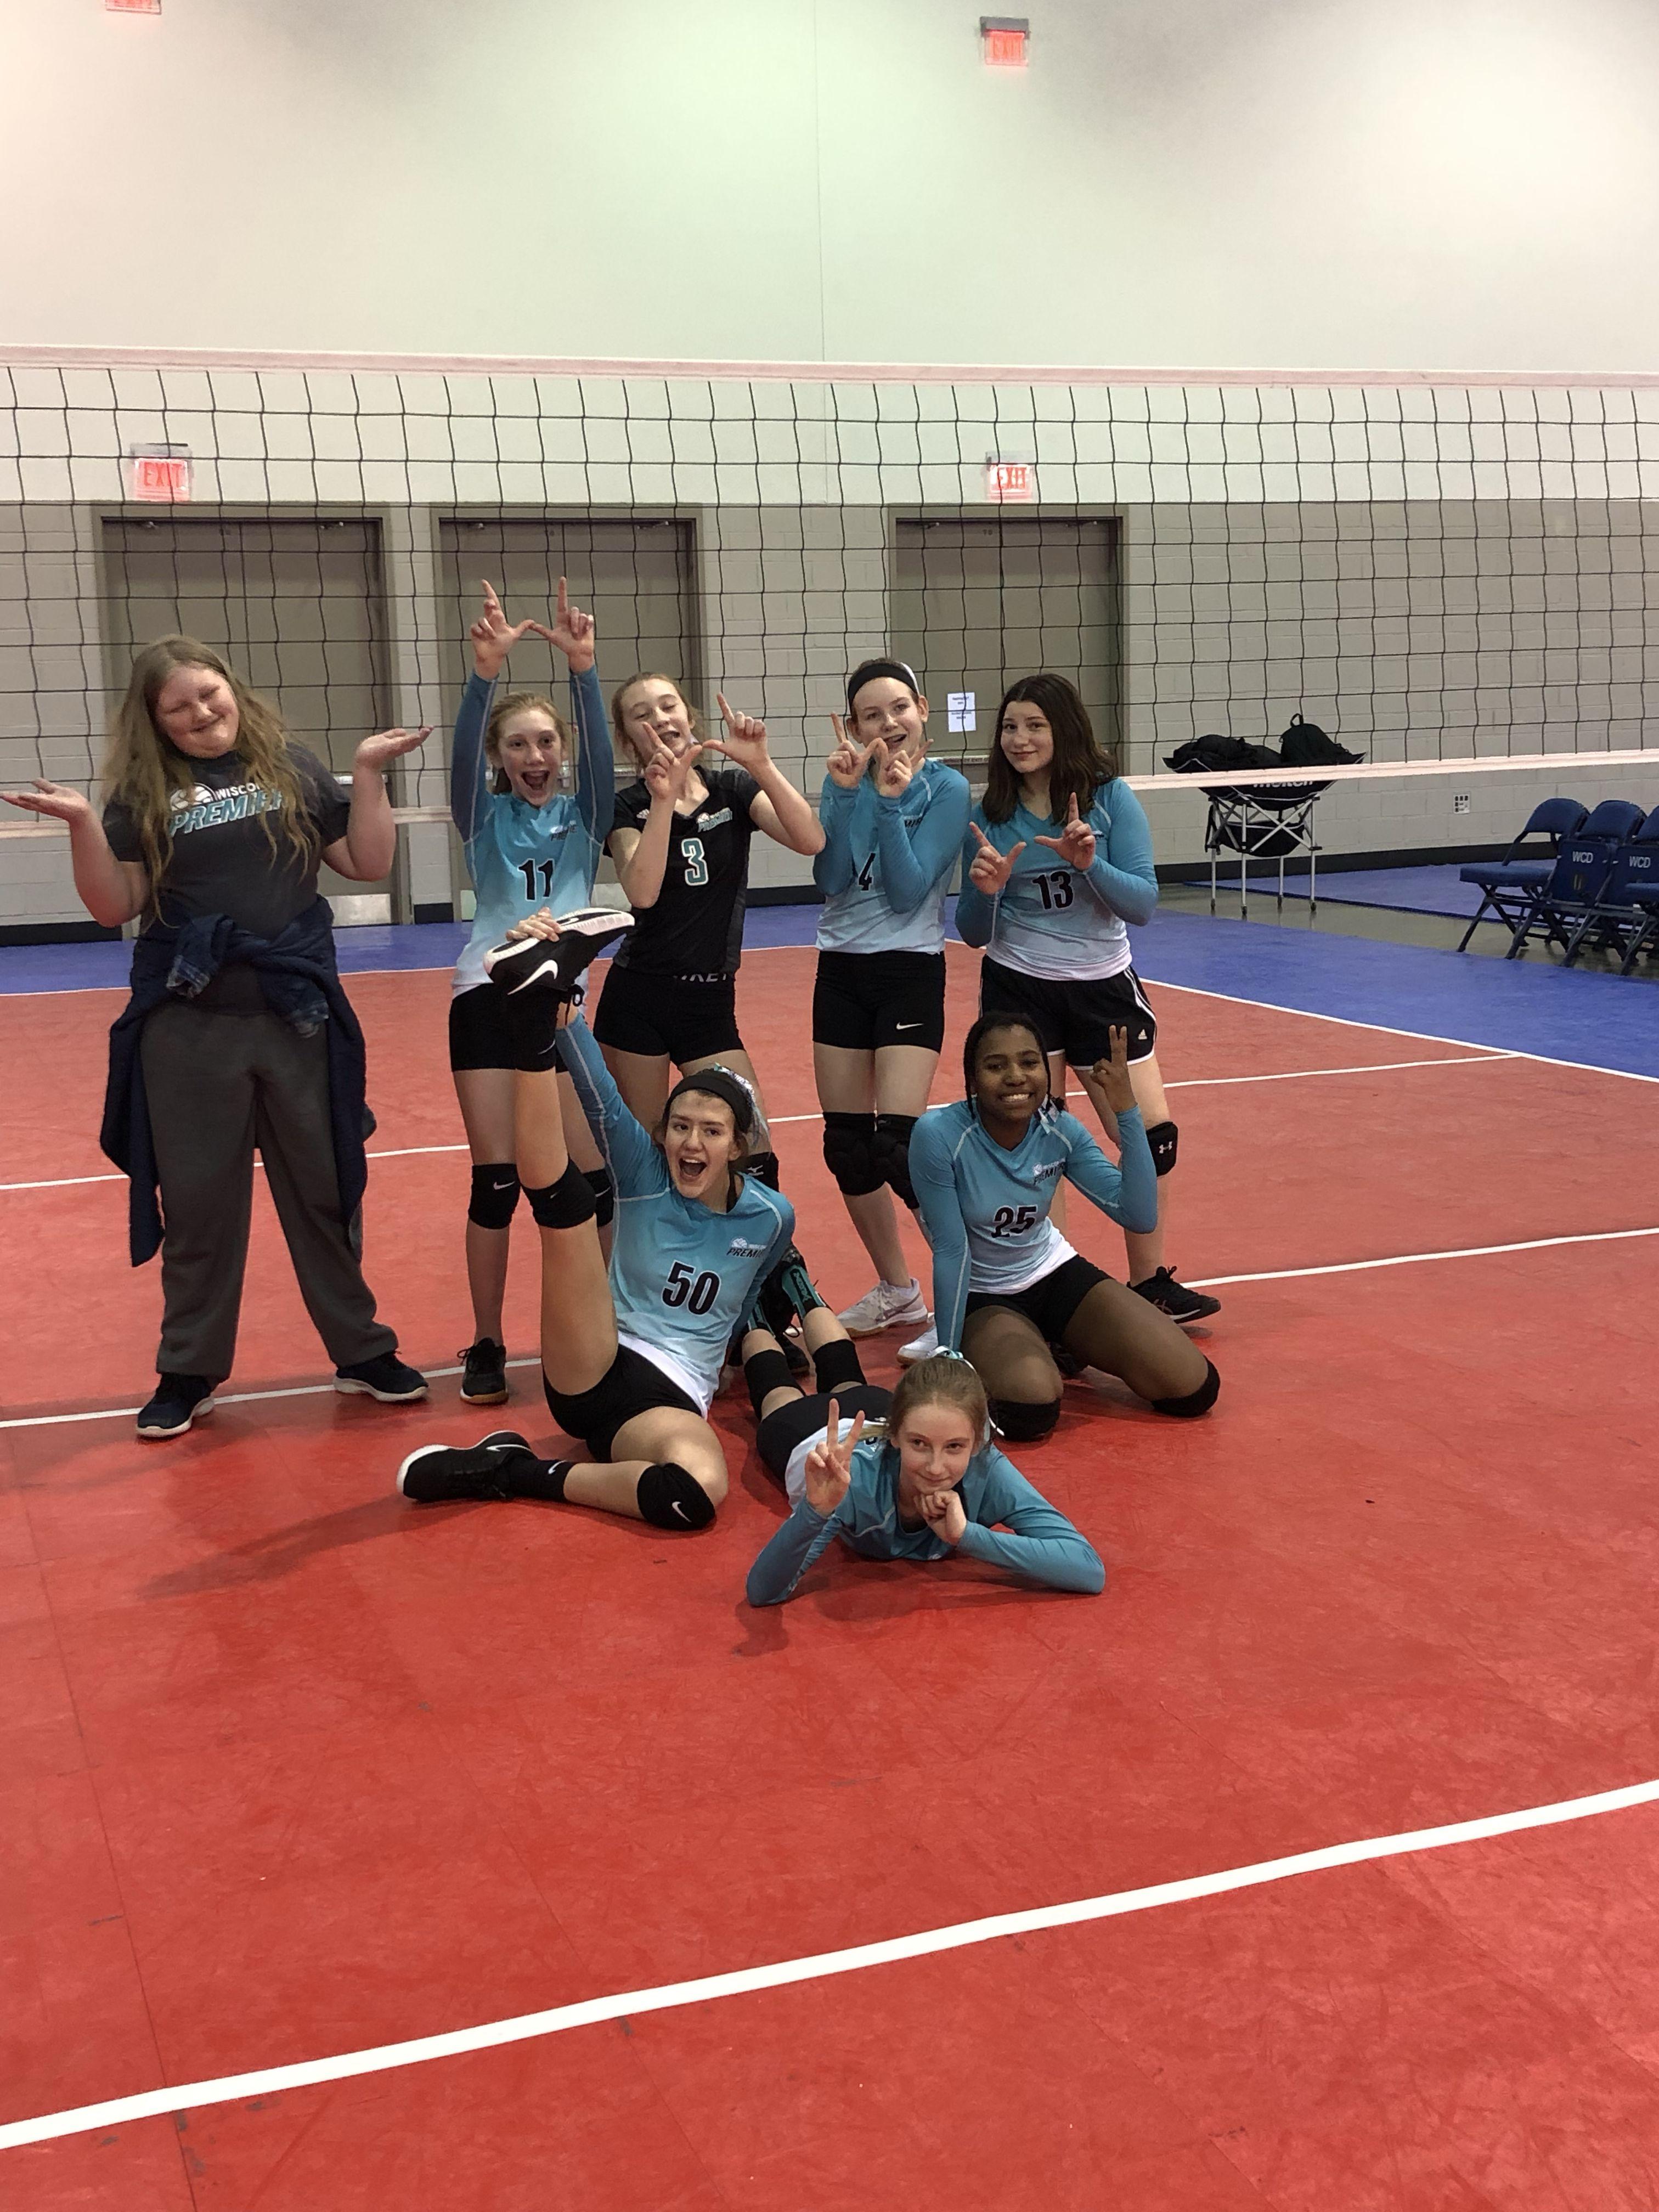 Volleyball Season Tournaments Sports Volleyball Shorts